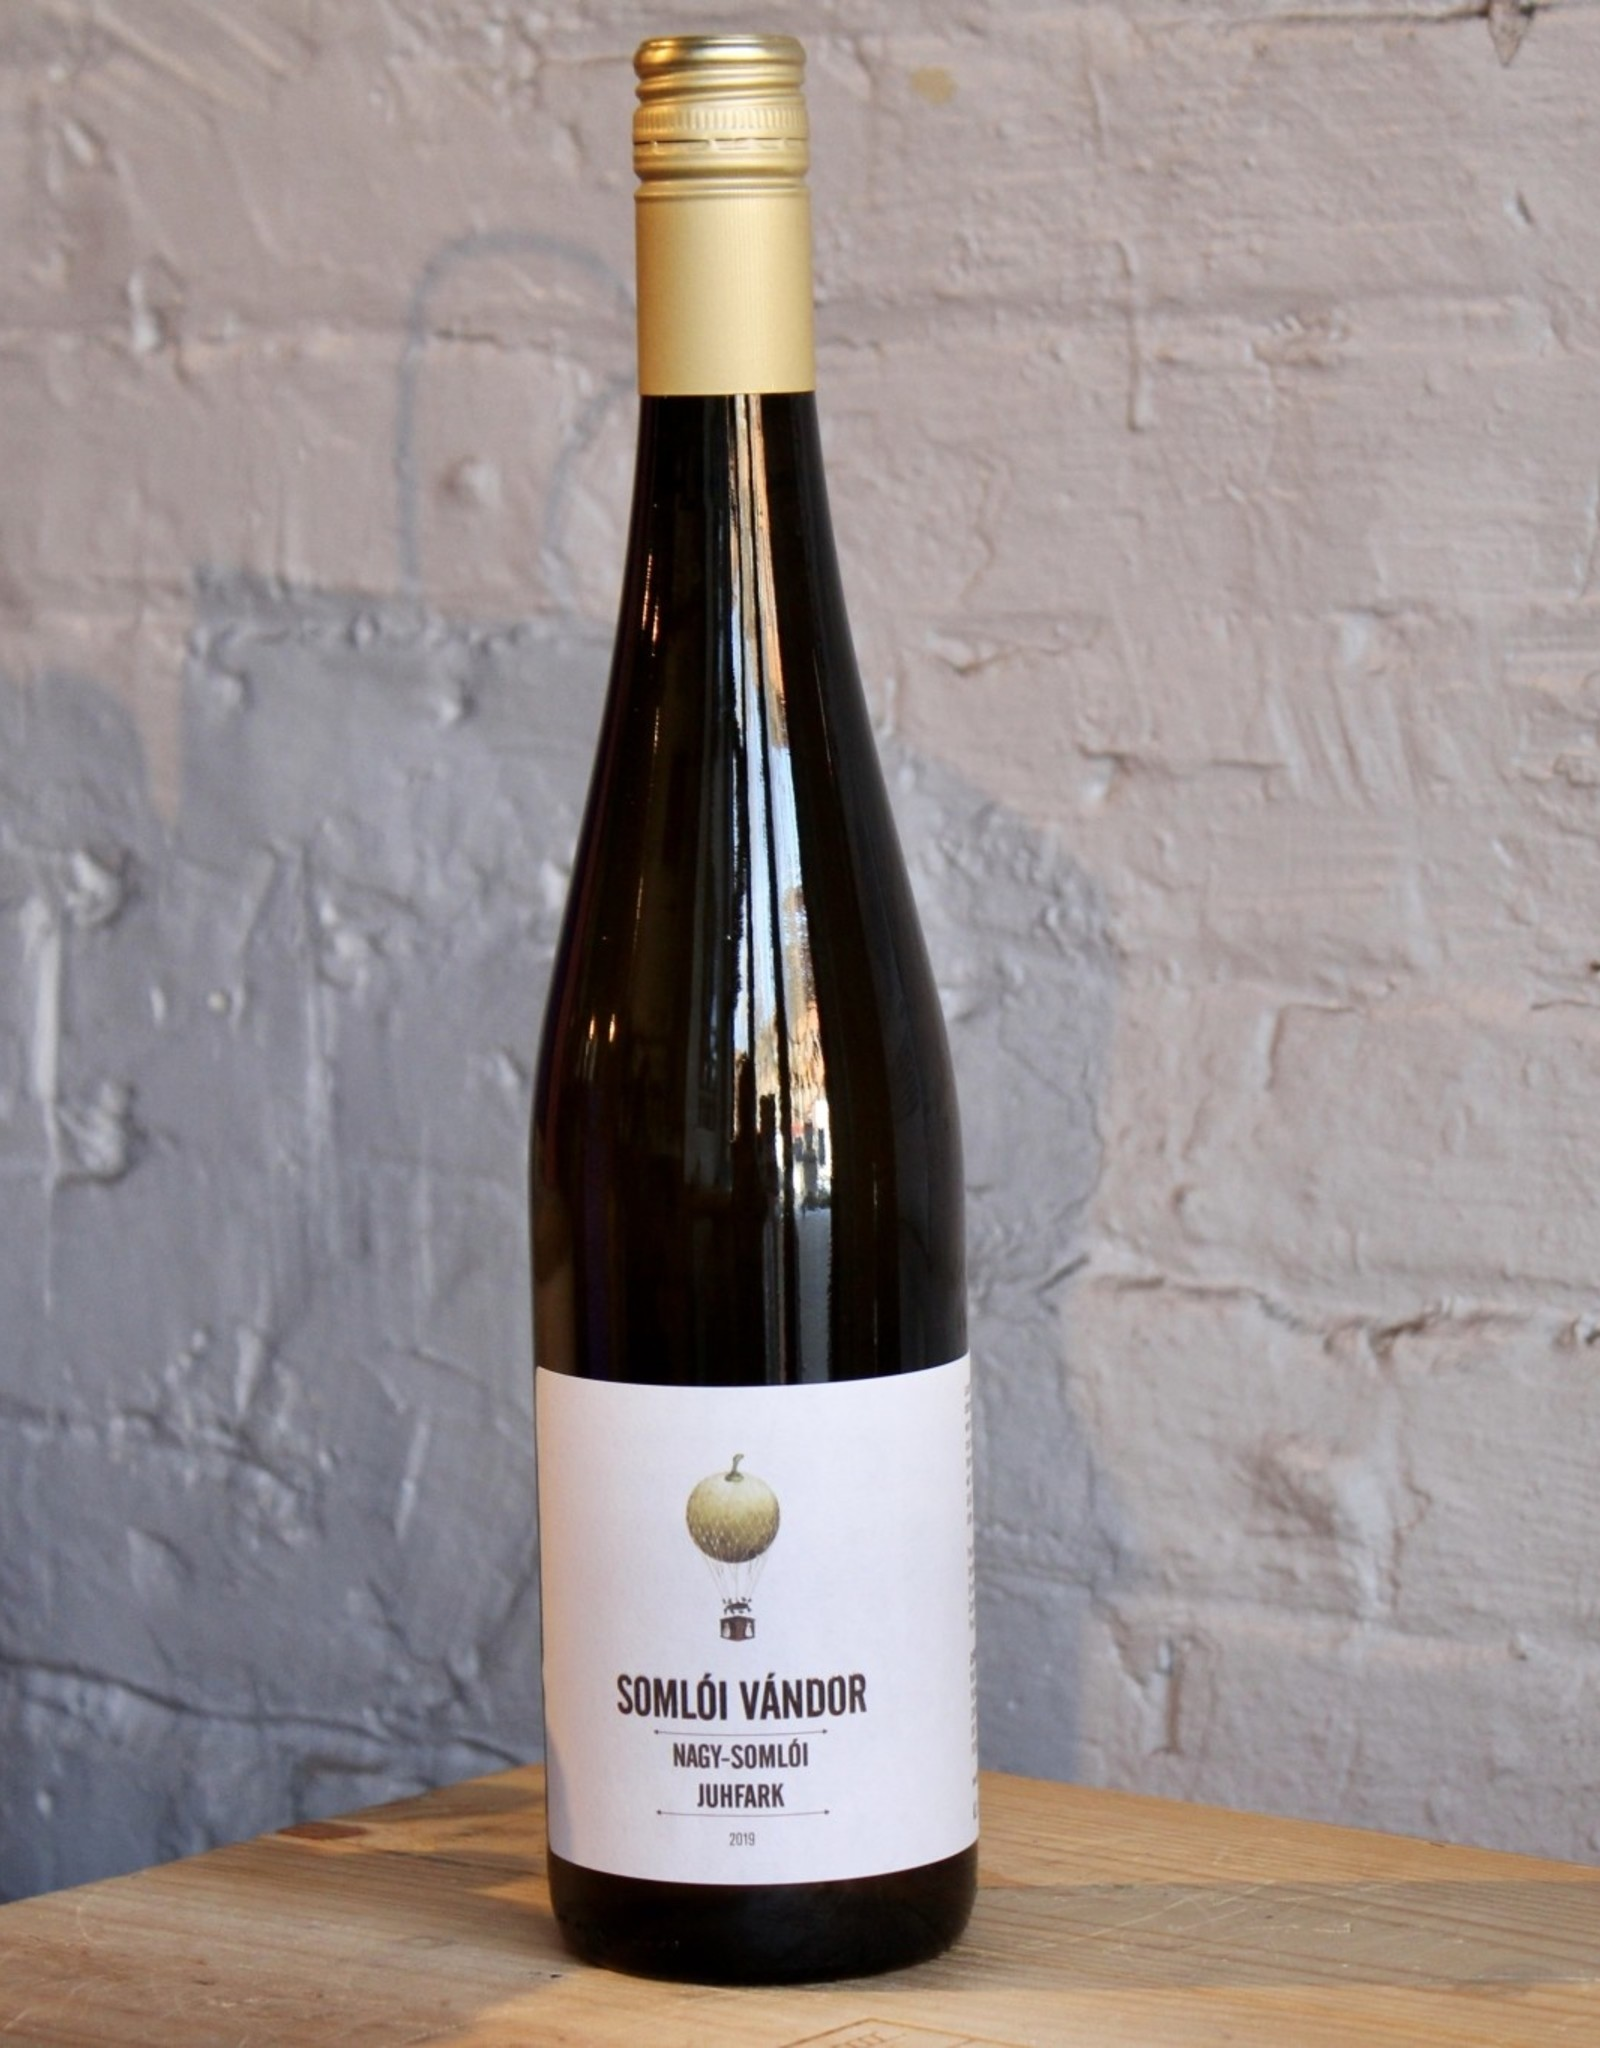 Wine 2019 Somlói Vándor Juhfark - Nagy-Somlói, Hungary (750ml)